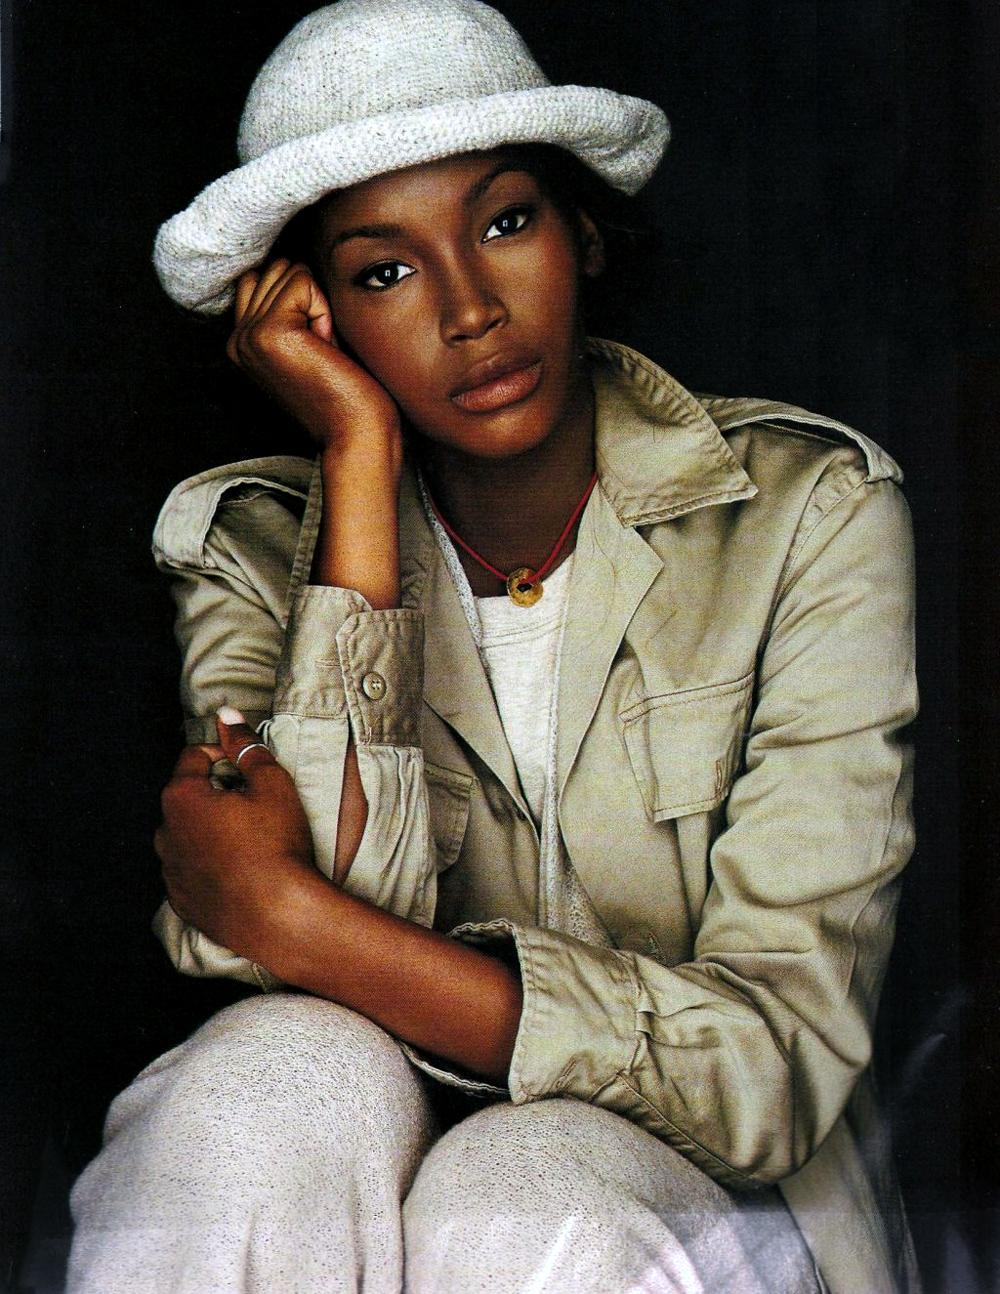 Elle US November 1993 via www.fashionedbylove.co.uk